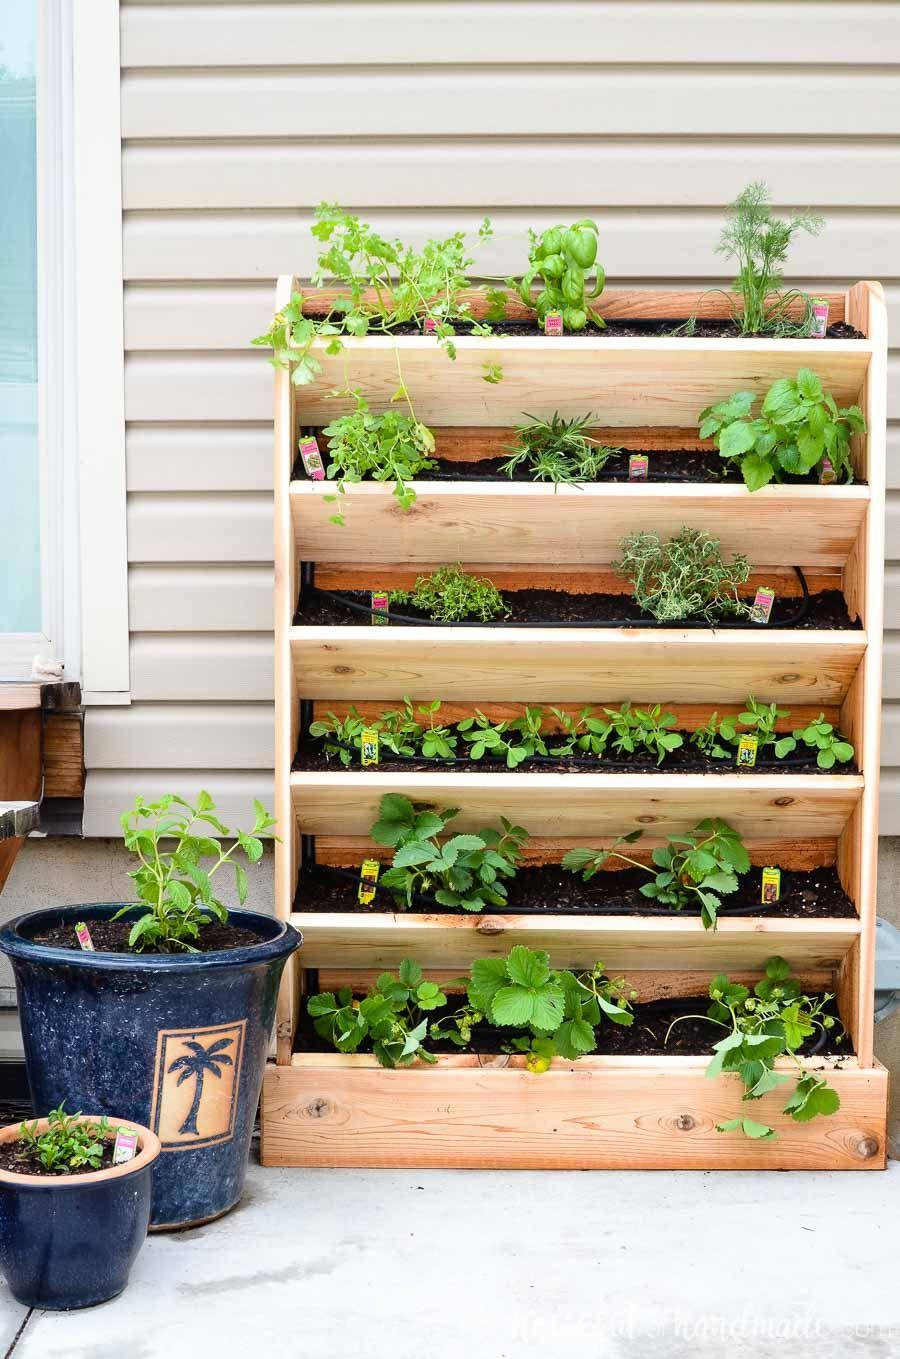 Diy Vertical Garden With Drip Watering System Vertical Garden Diy Vertical Herb Garden Vertical Vegetable Garden